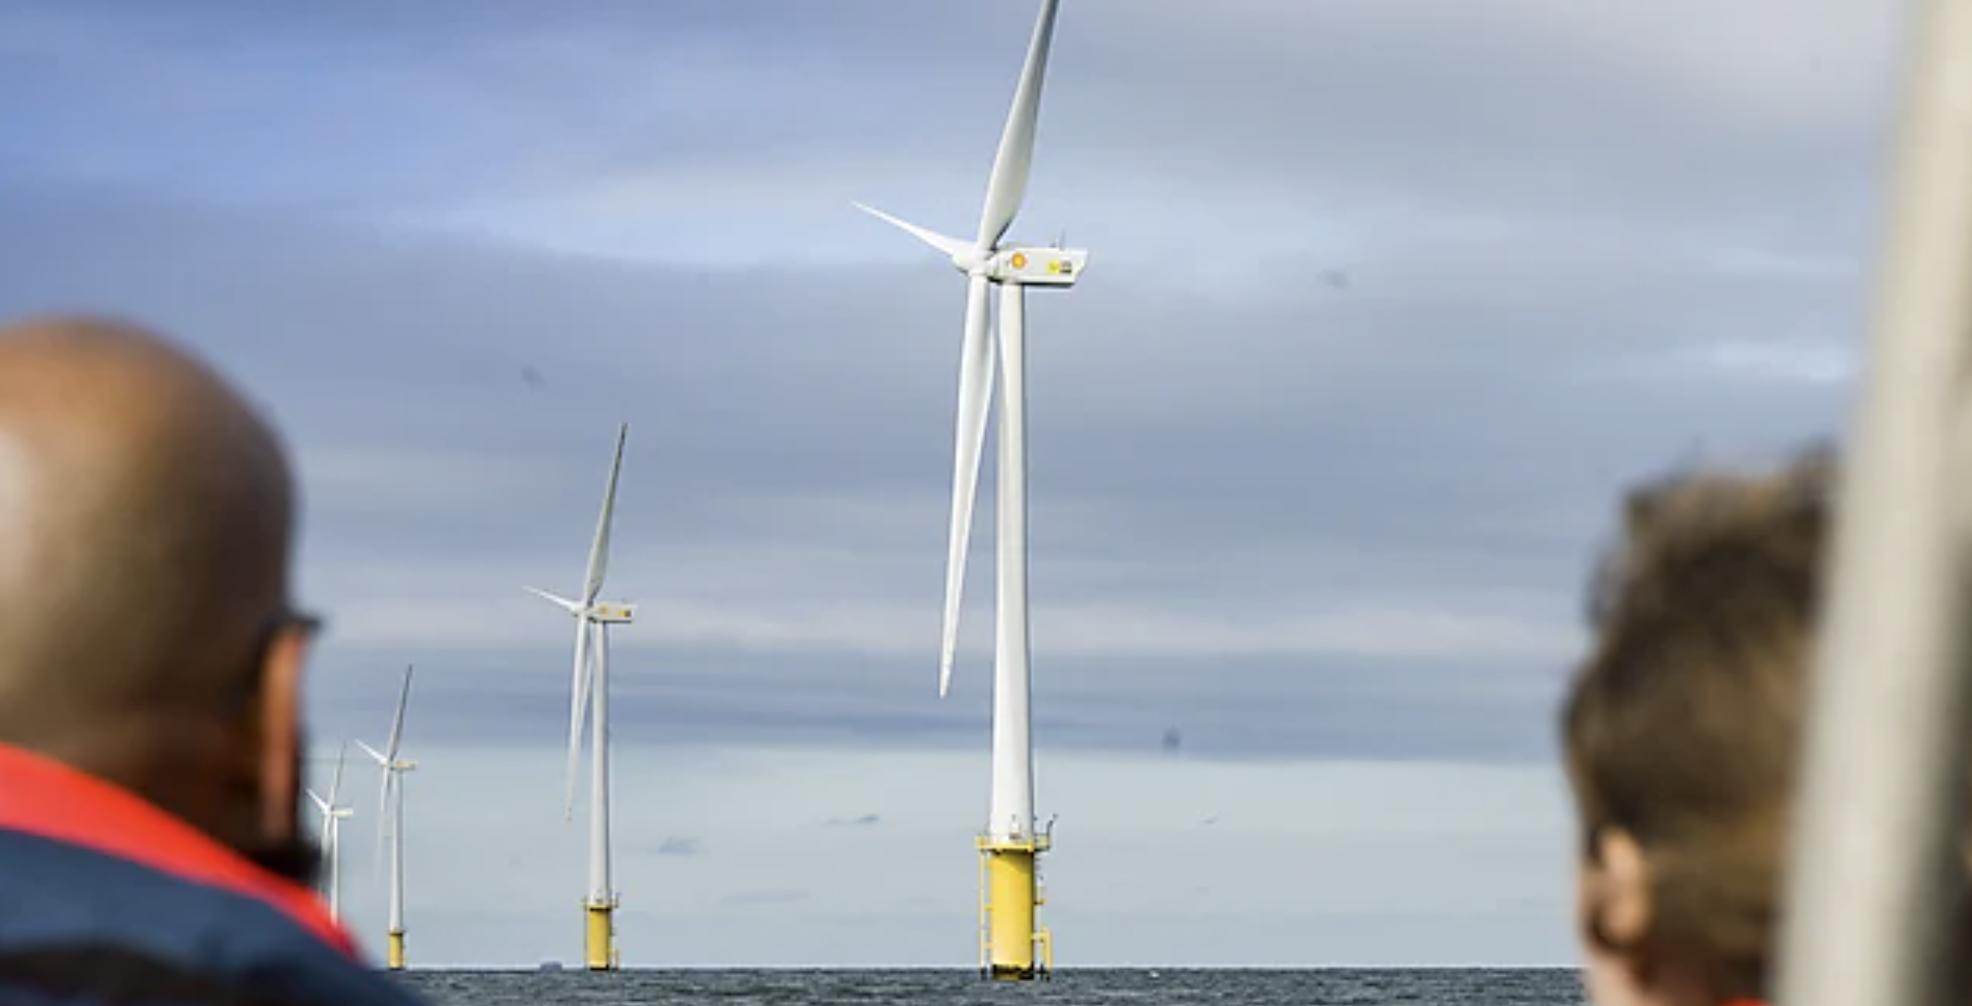 Joint venture targets 'vast potential' of U.S. floating offshore wind market